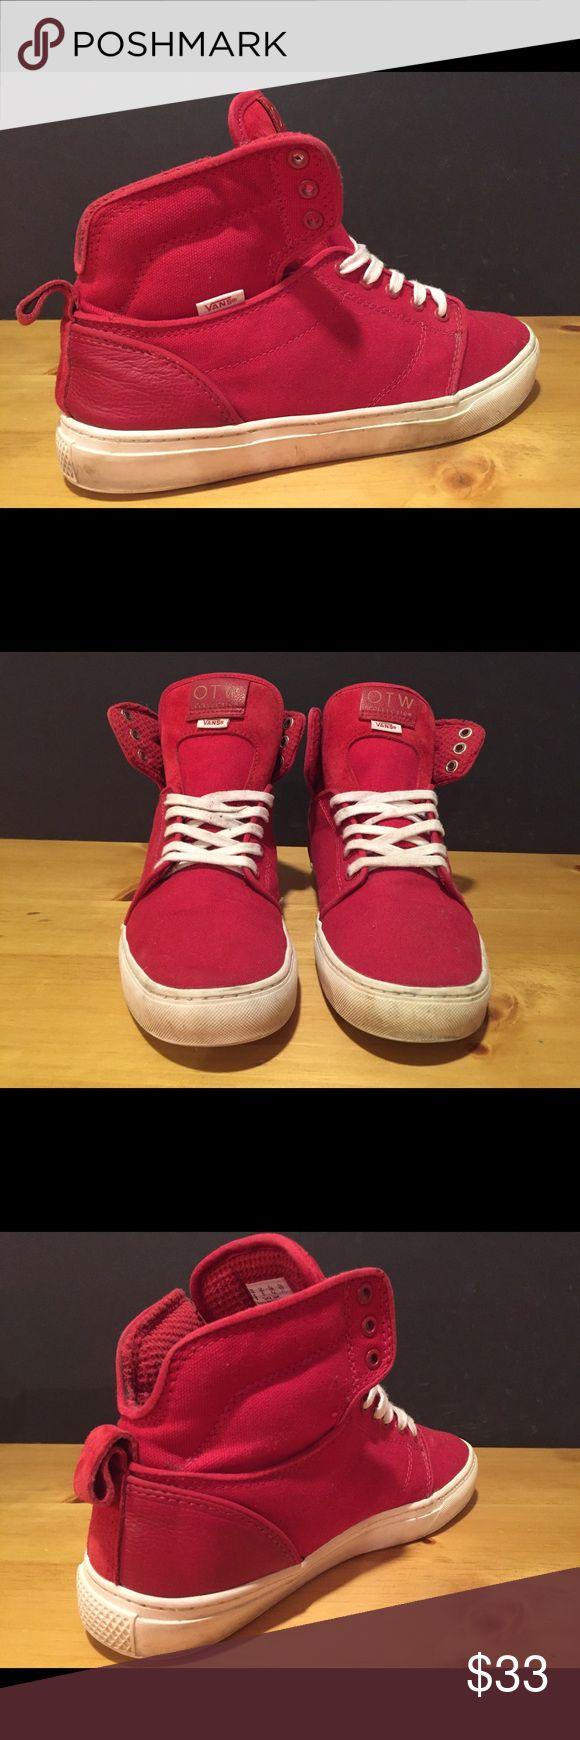 Vans OTW Collection Shoes - Men Size 9 - Red Vans OTW Collection Shoes - Men Size 9 - Red - Pre owned, good condition- See pictures Vans Shoes Sneakers